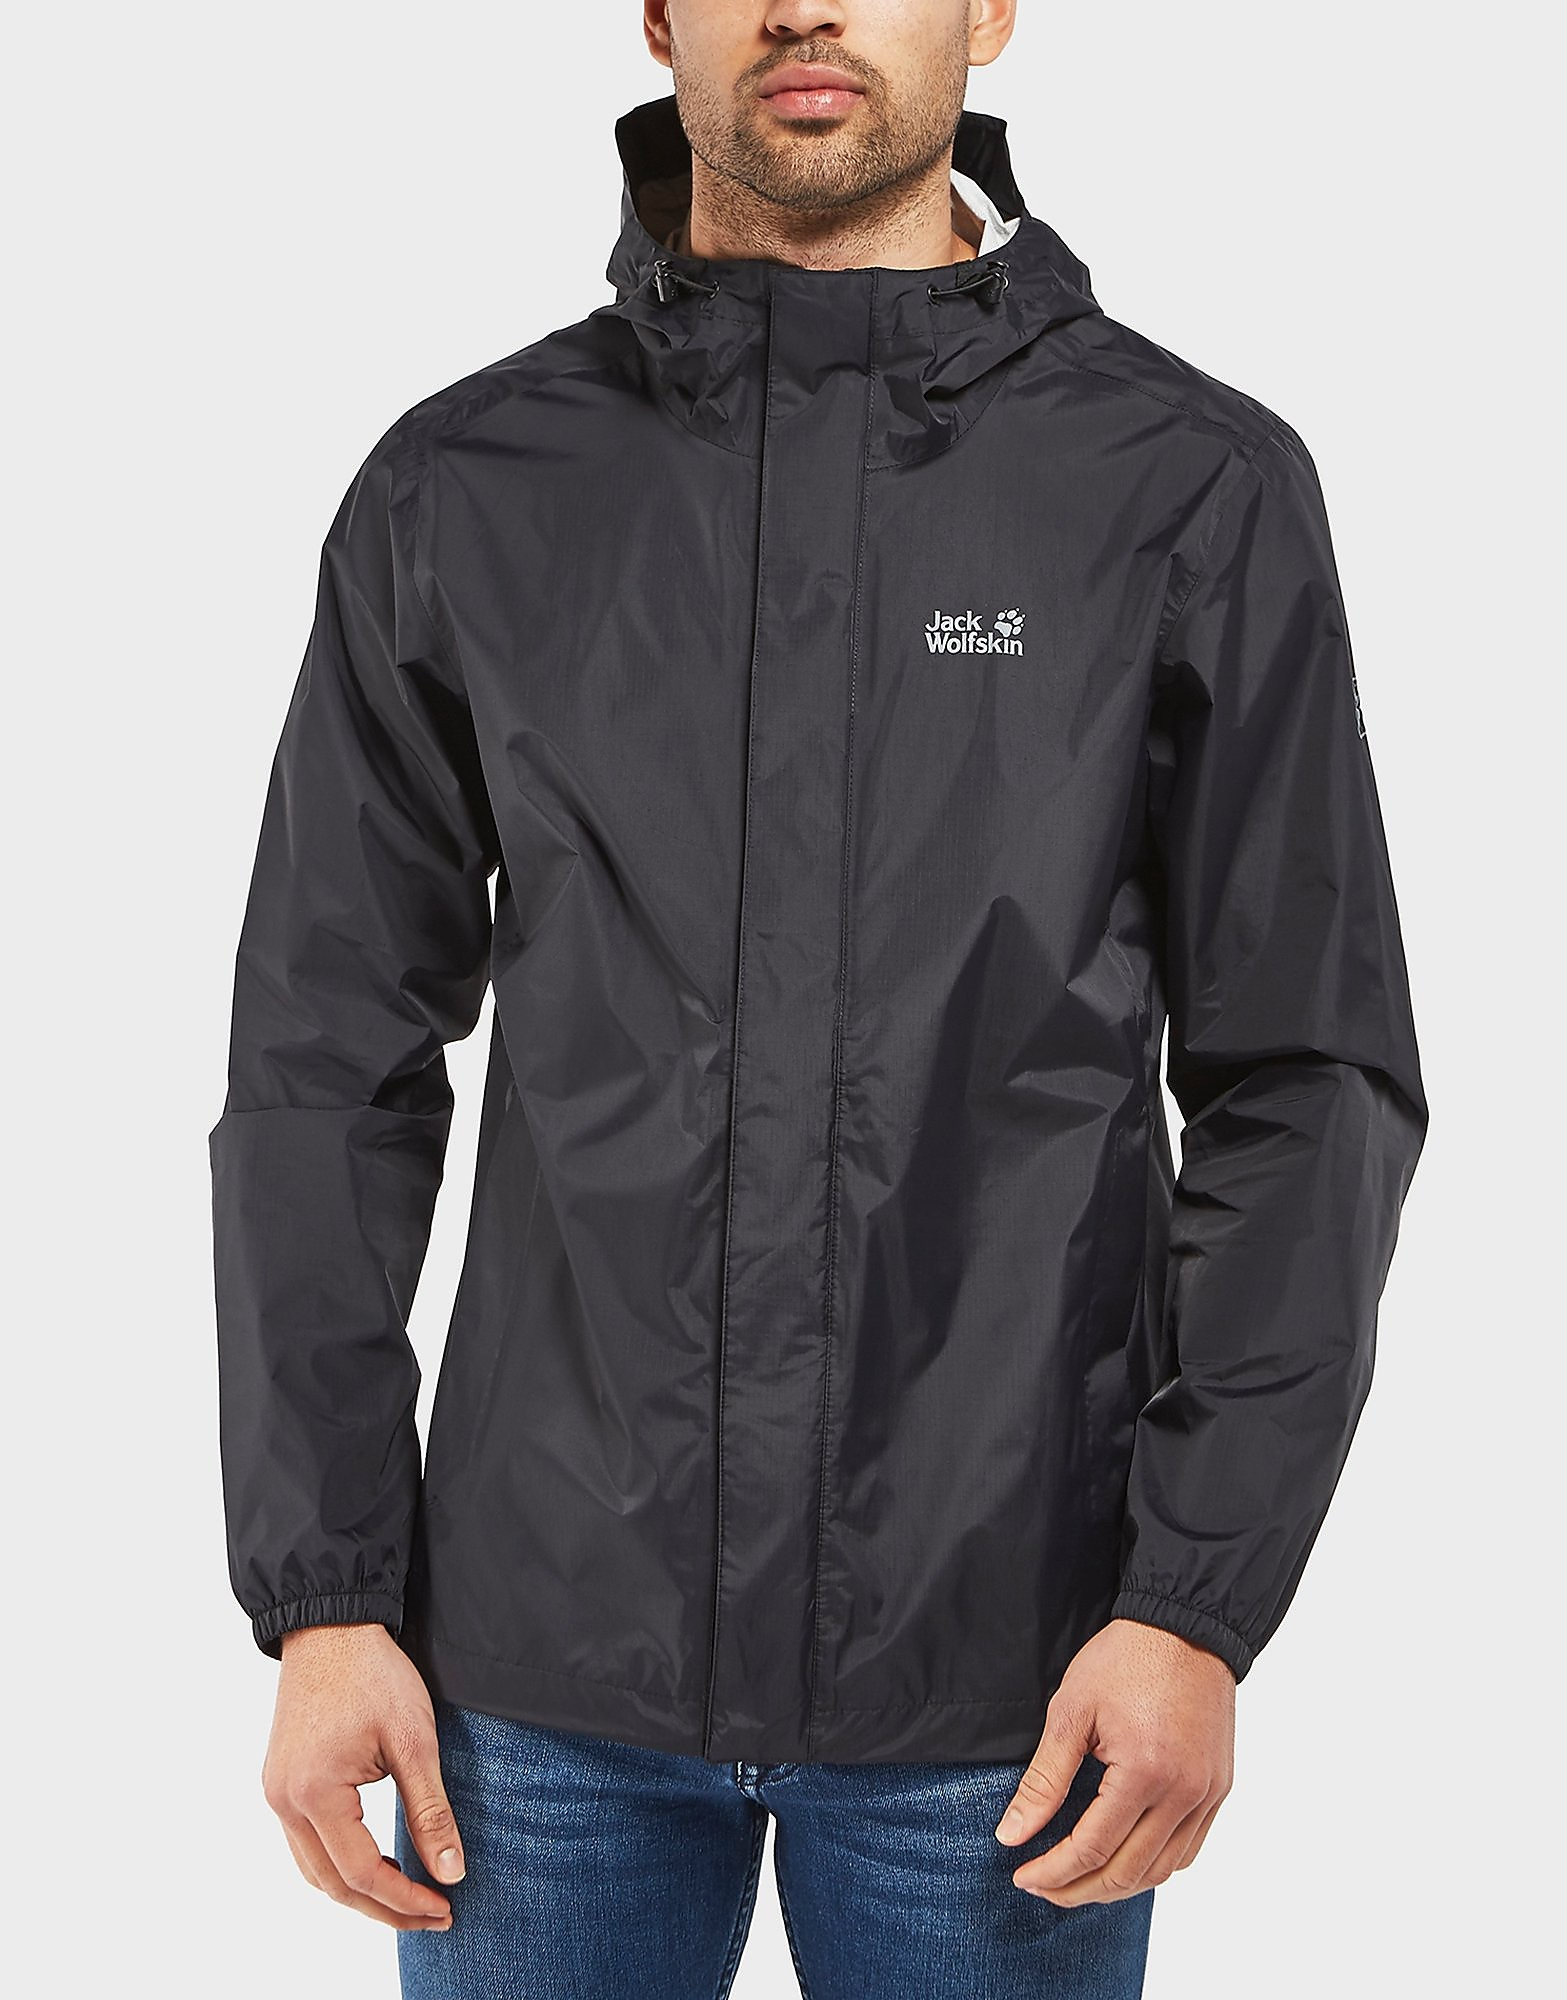 Jack Wolfskin Cloudburst Lightweight Hooded Jacket